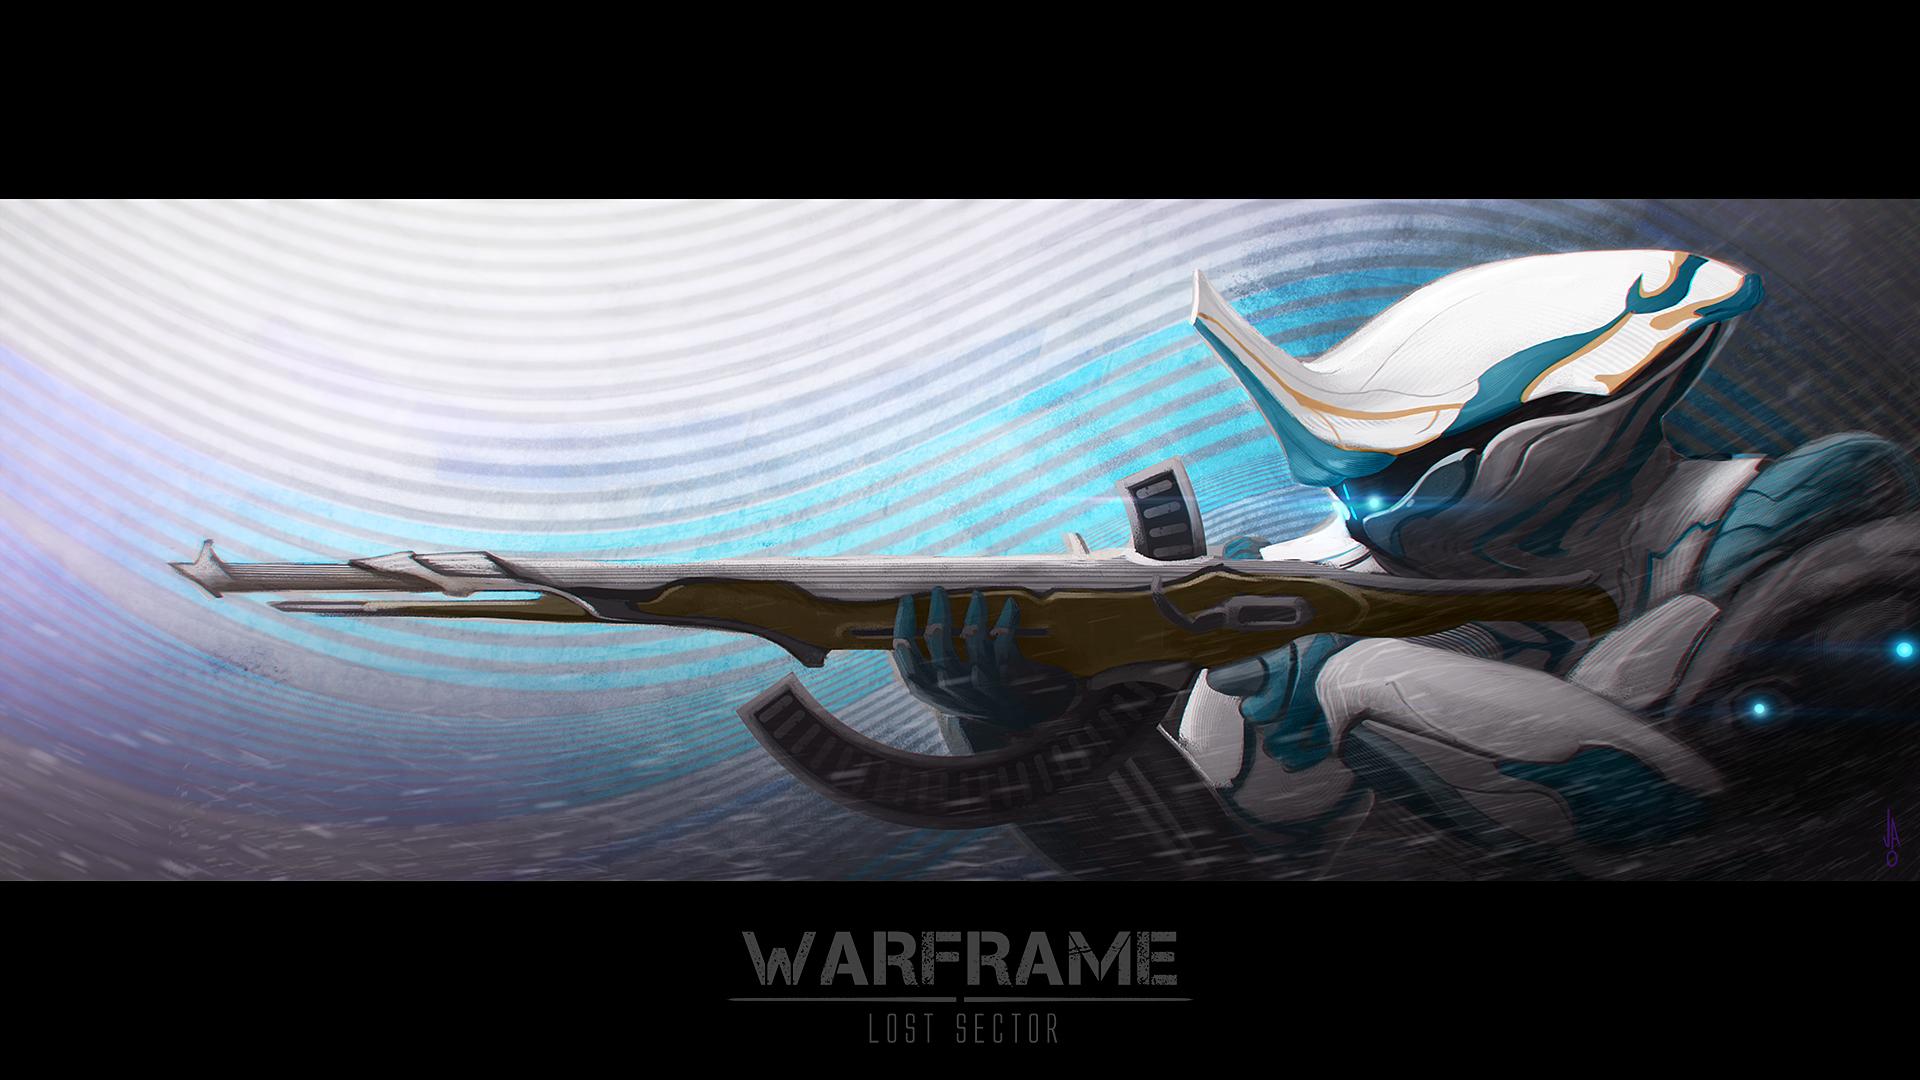 98 Best Warframe Wallpapers images | Arte fantasia, Jogos ...